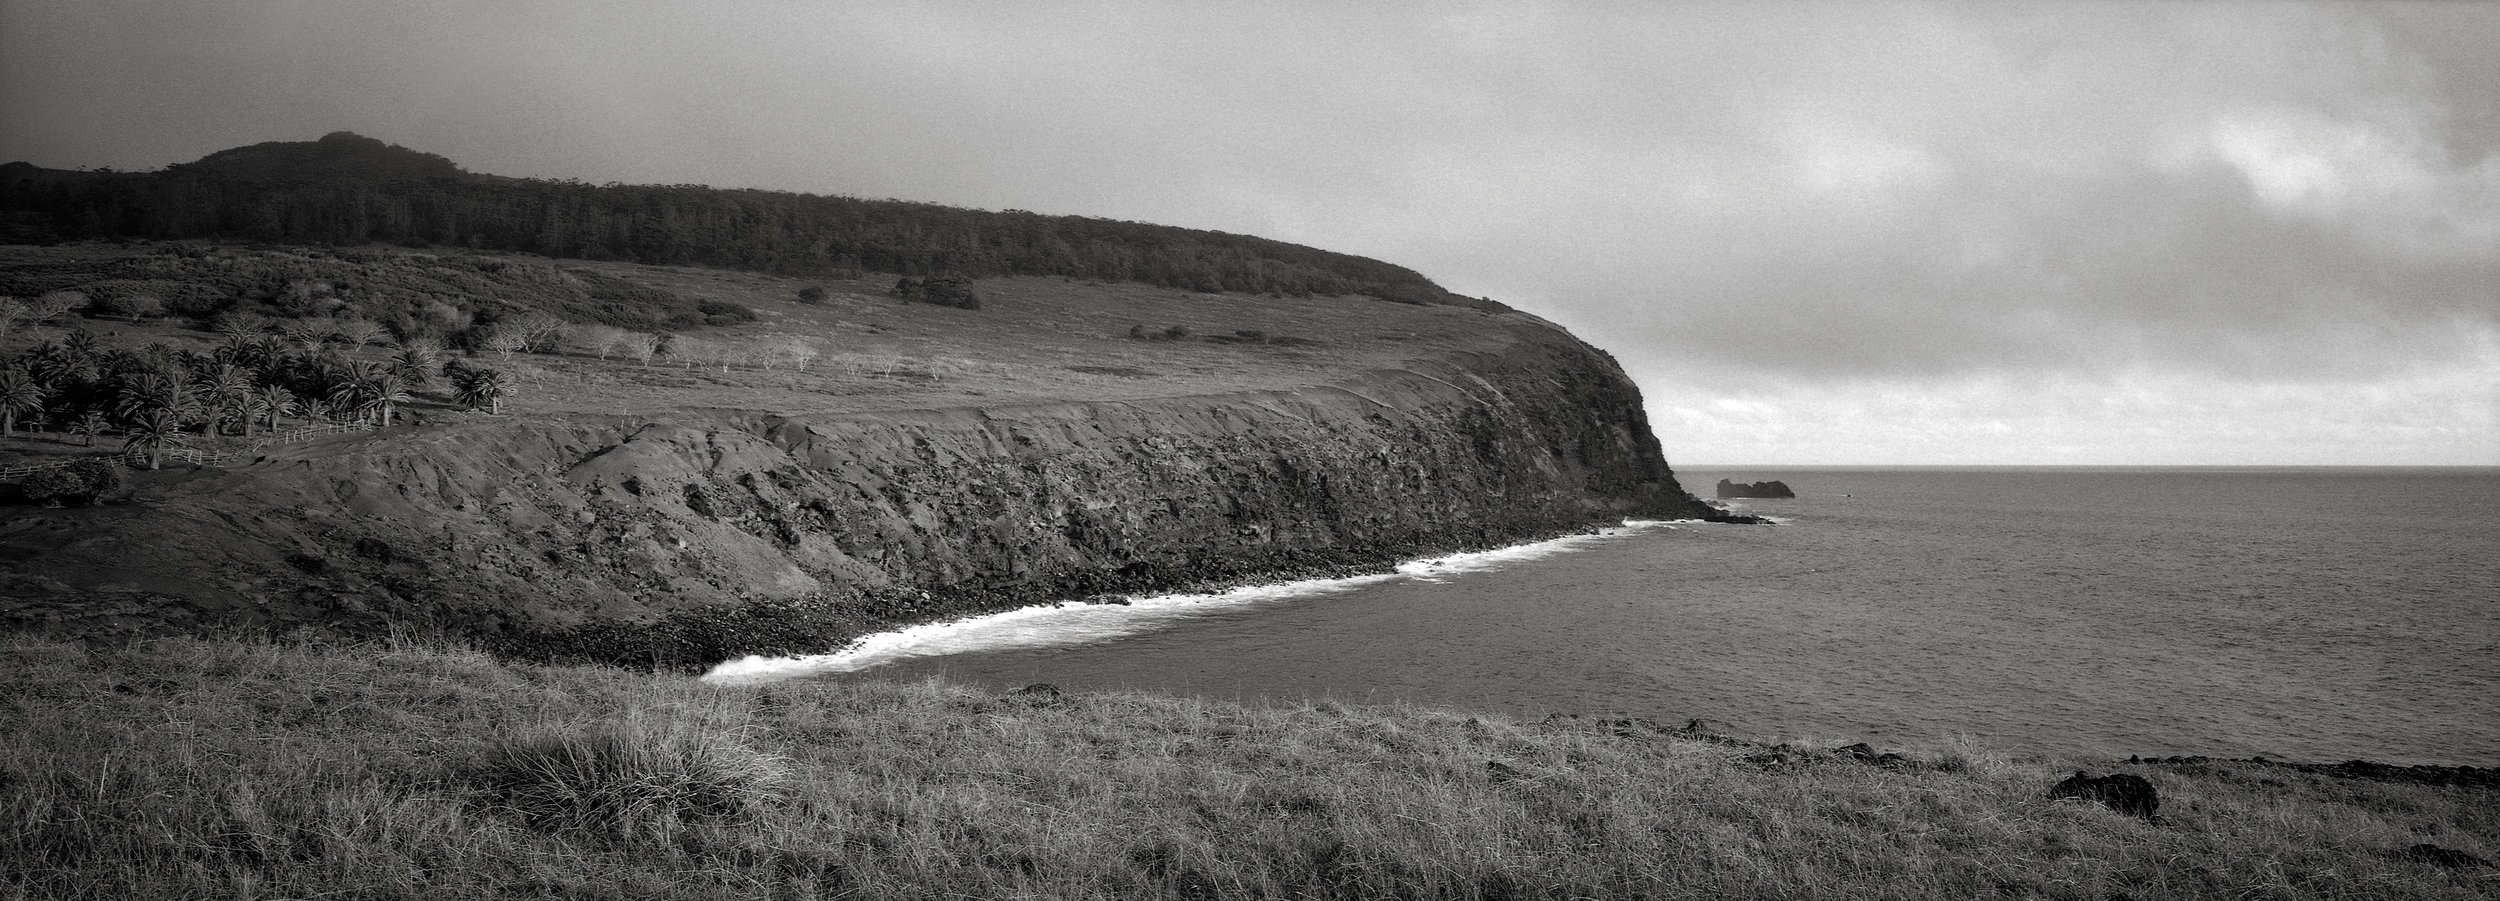 Headland, Easter Island